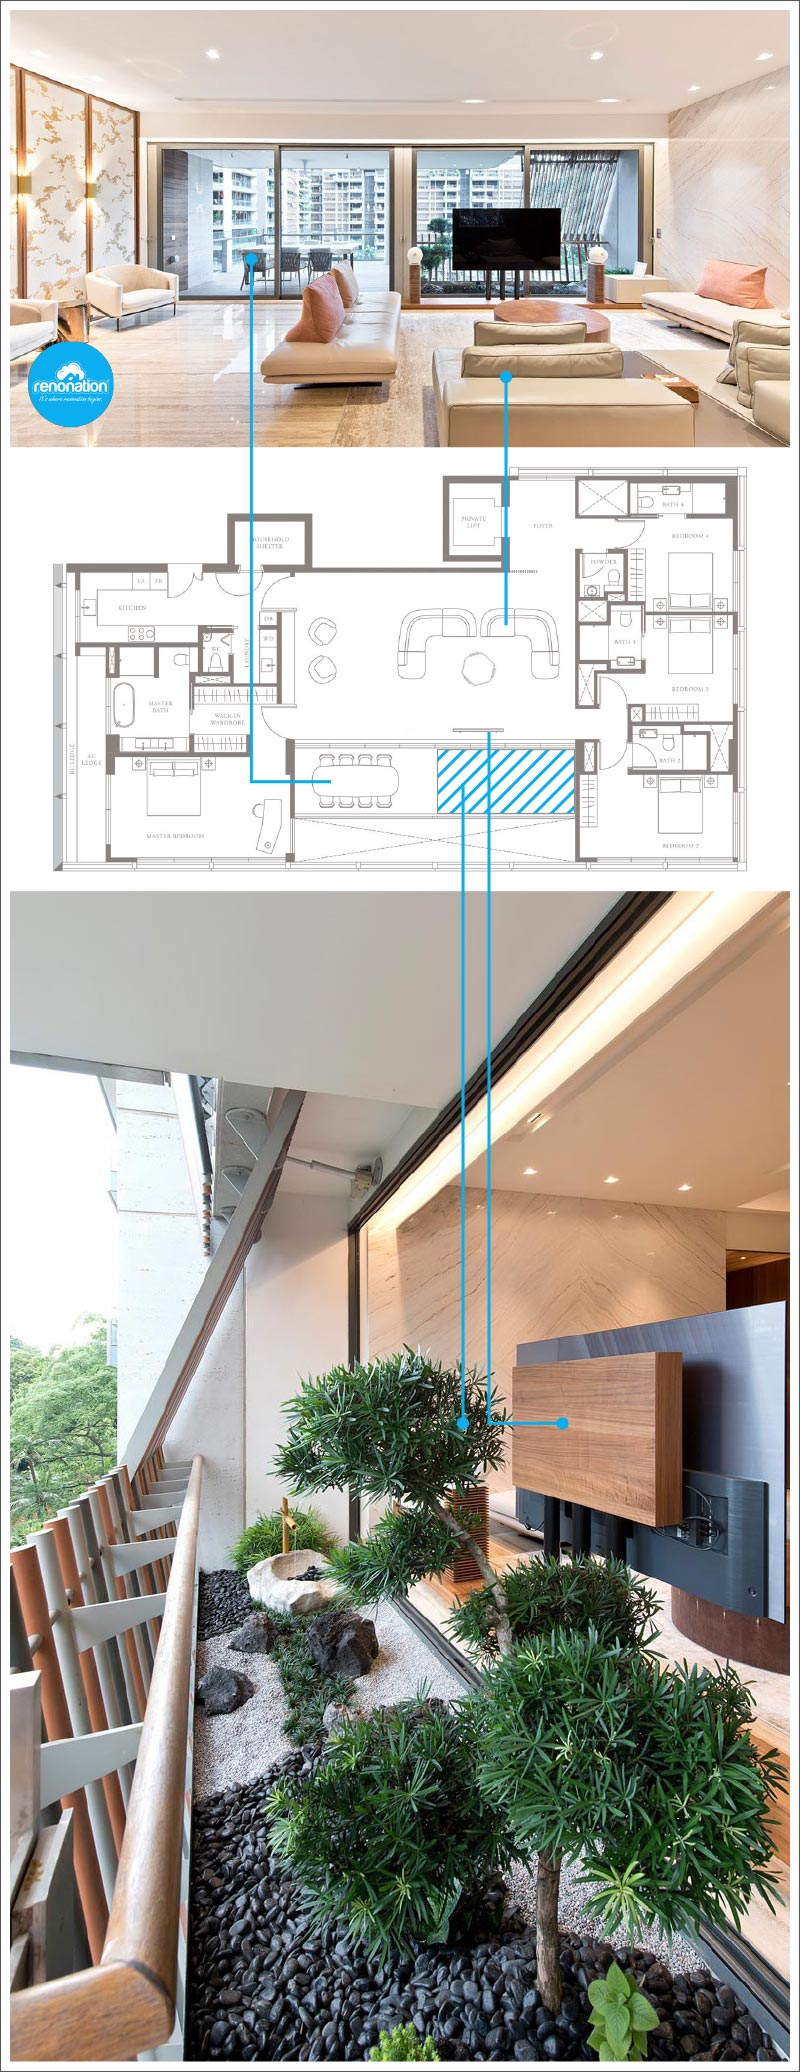 MEYERHOUSE - Designs: Architology